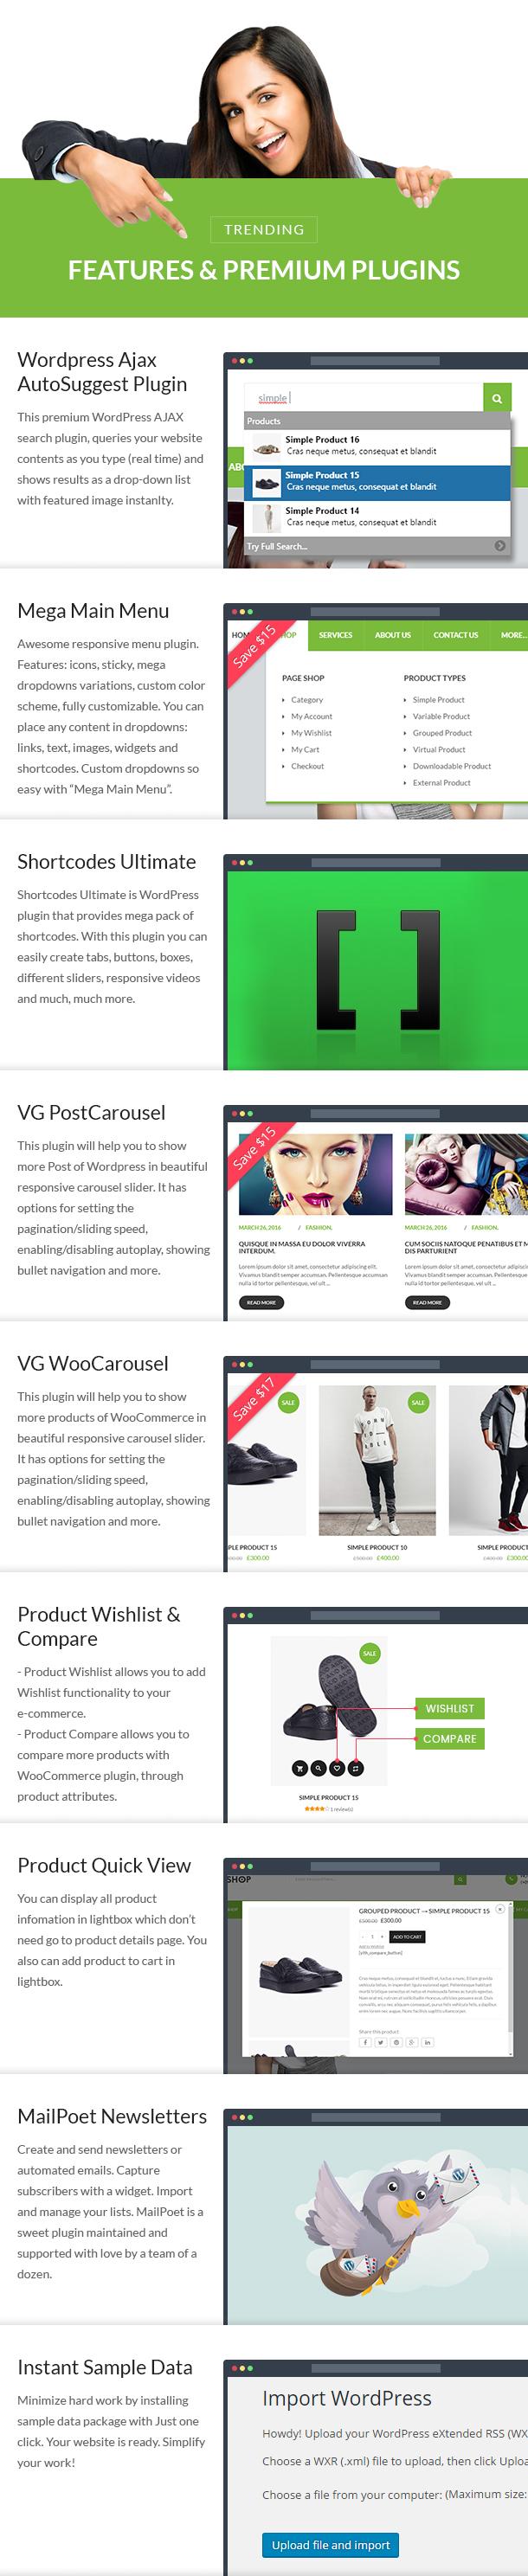 VG JanShop - Responsive WooCommerce WordPress Theme - 13